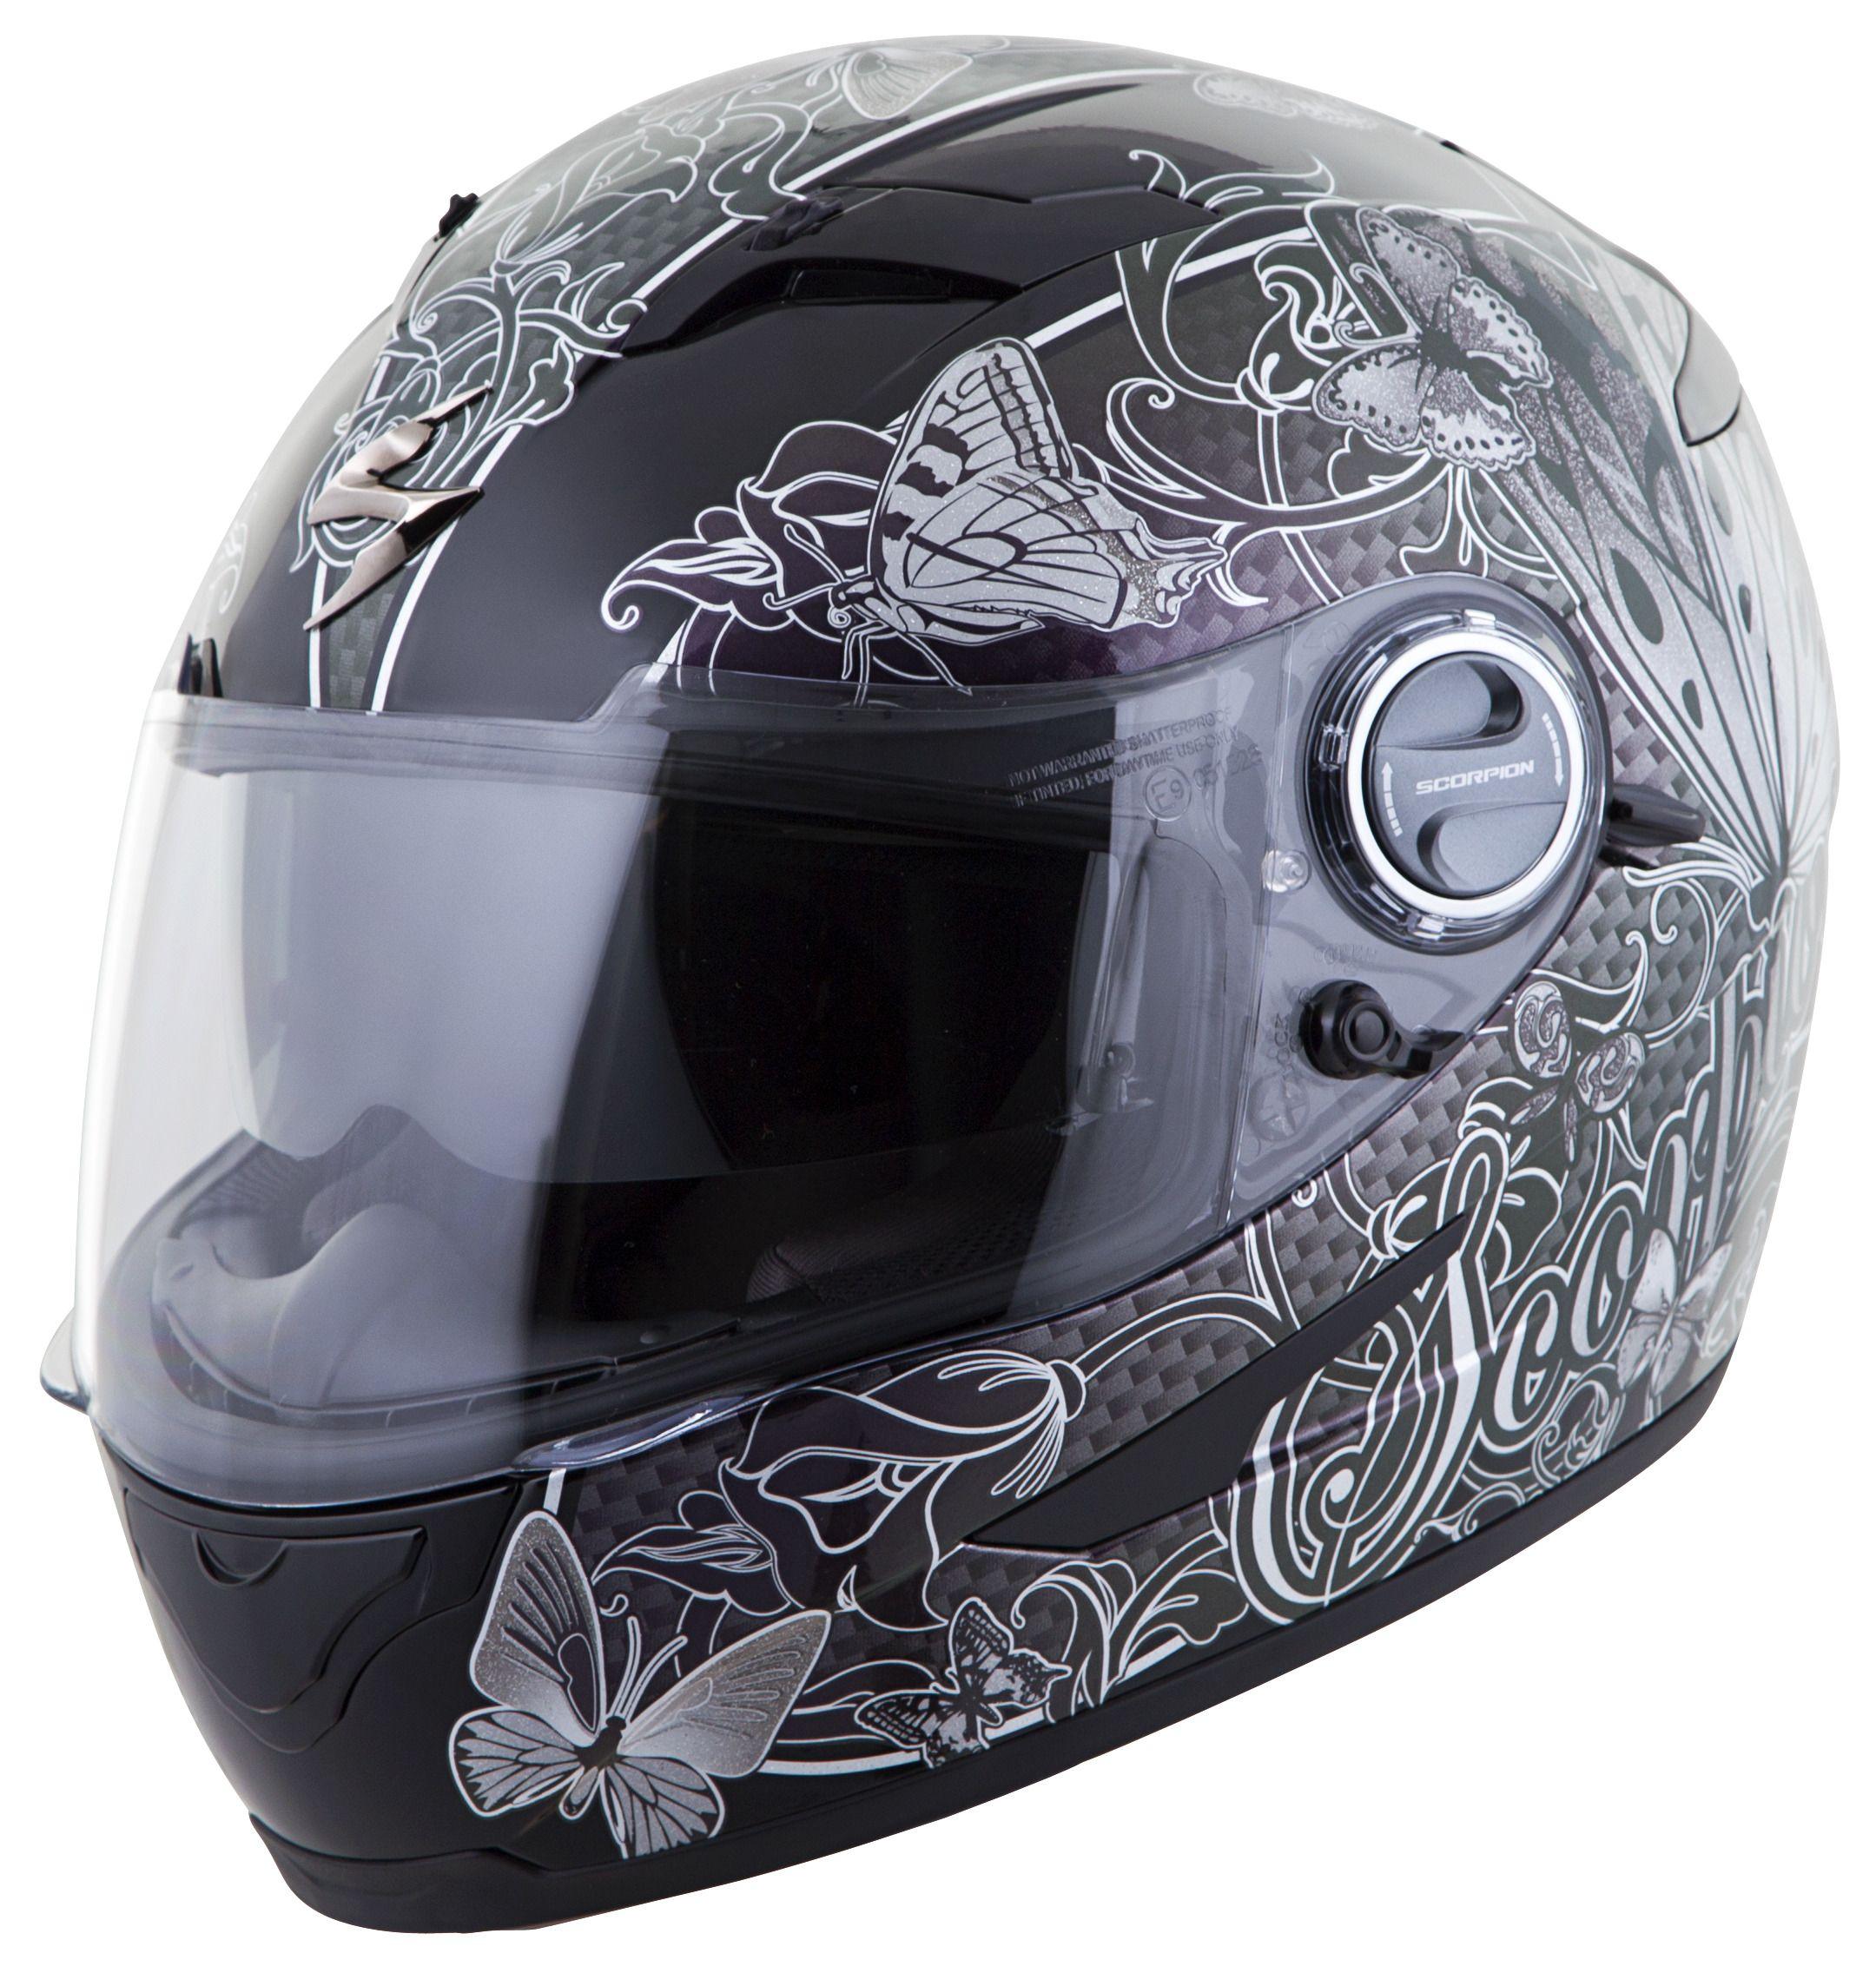 scorpion exo 500 mariposa women 39 s helmet revzilla. Black Bedroom Furniture Sets. Home Design Ideas